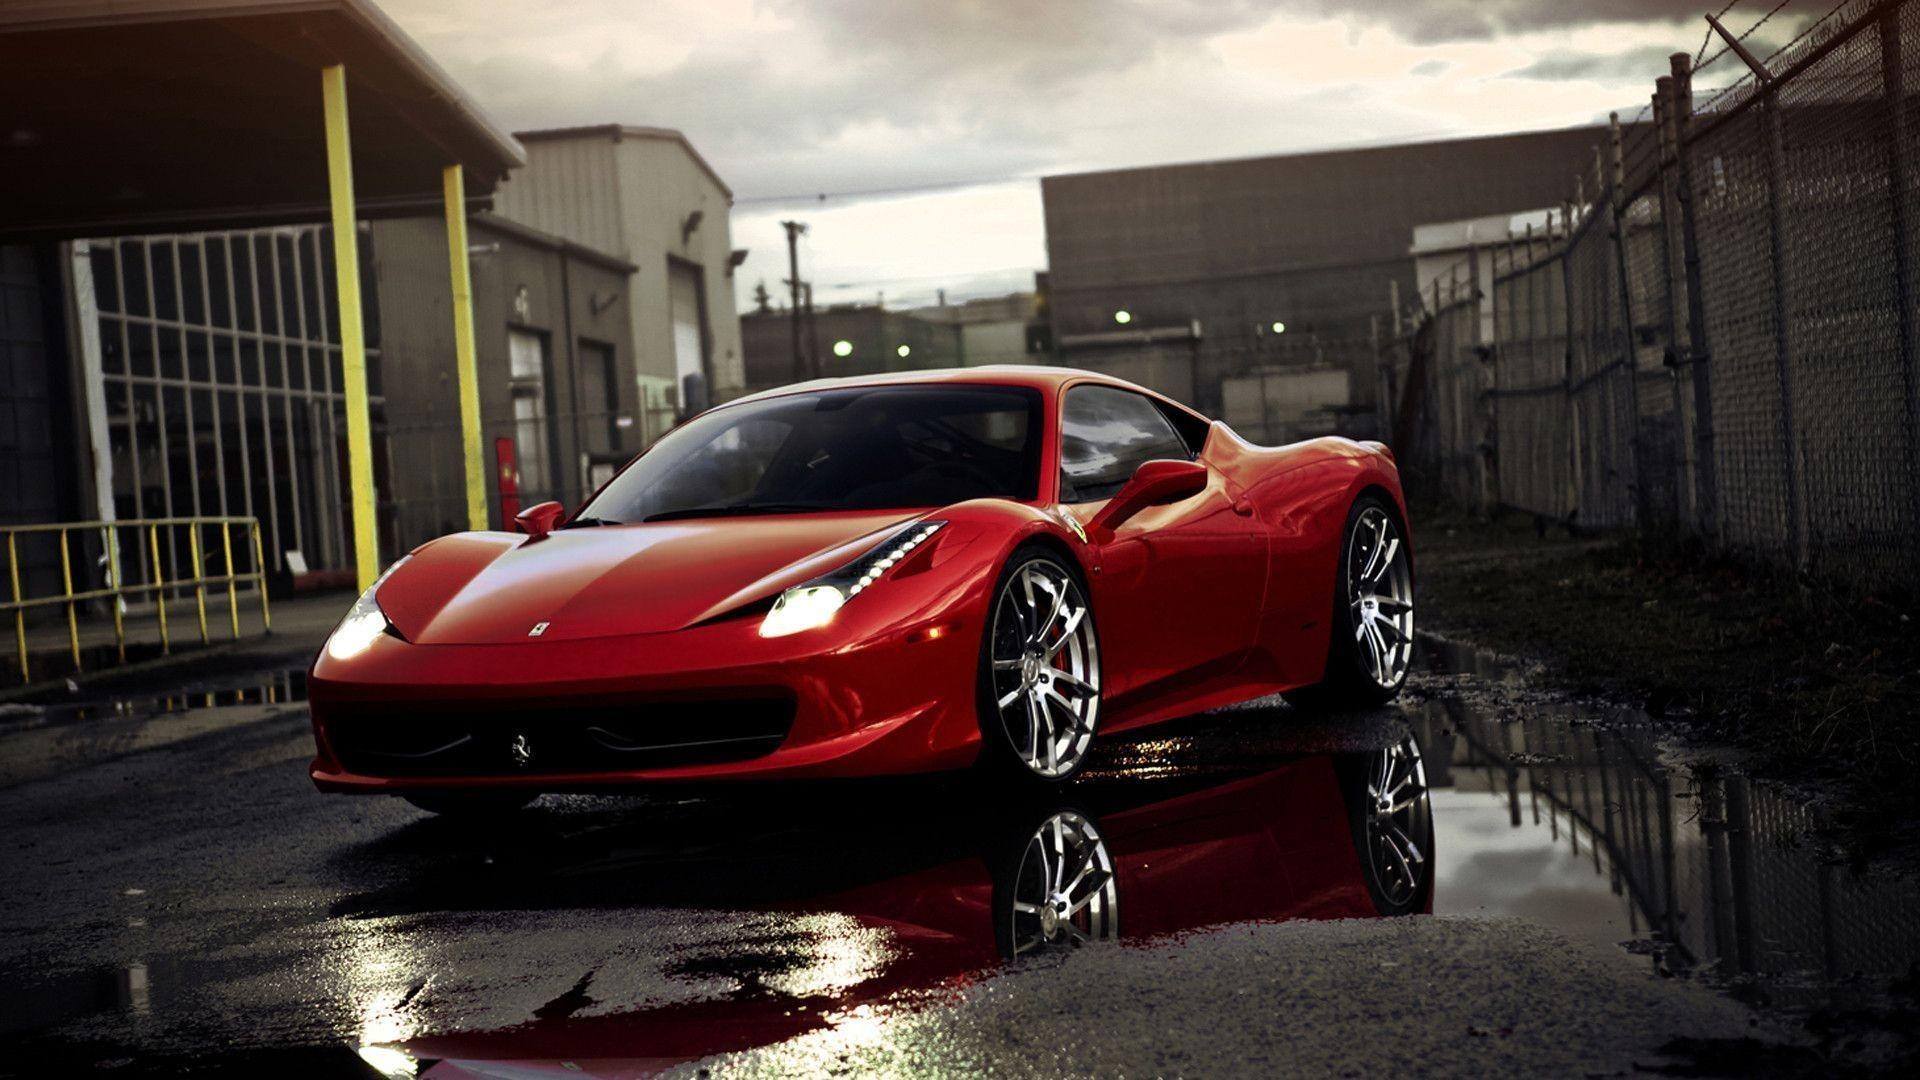 Ferrari 458 Italia Wallpaper HD (75+ pictures)